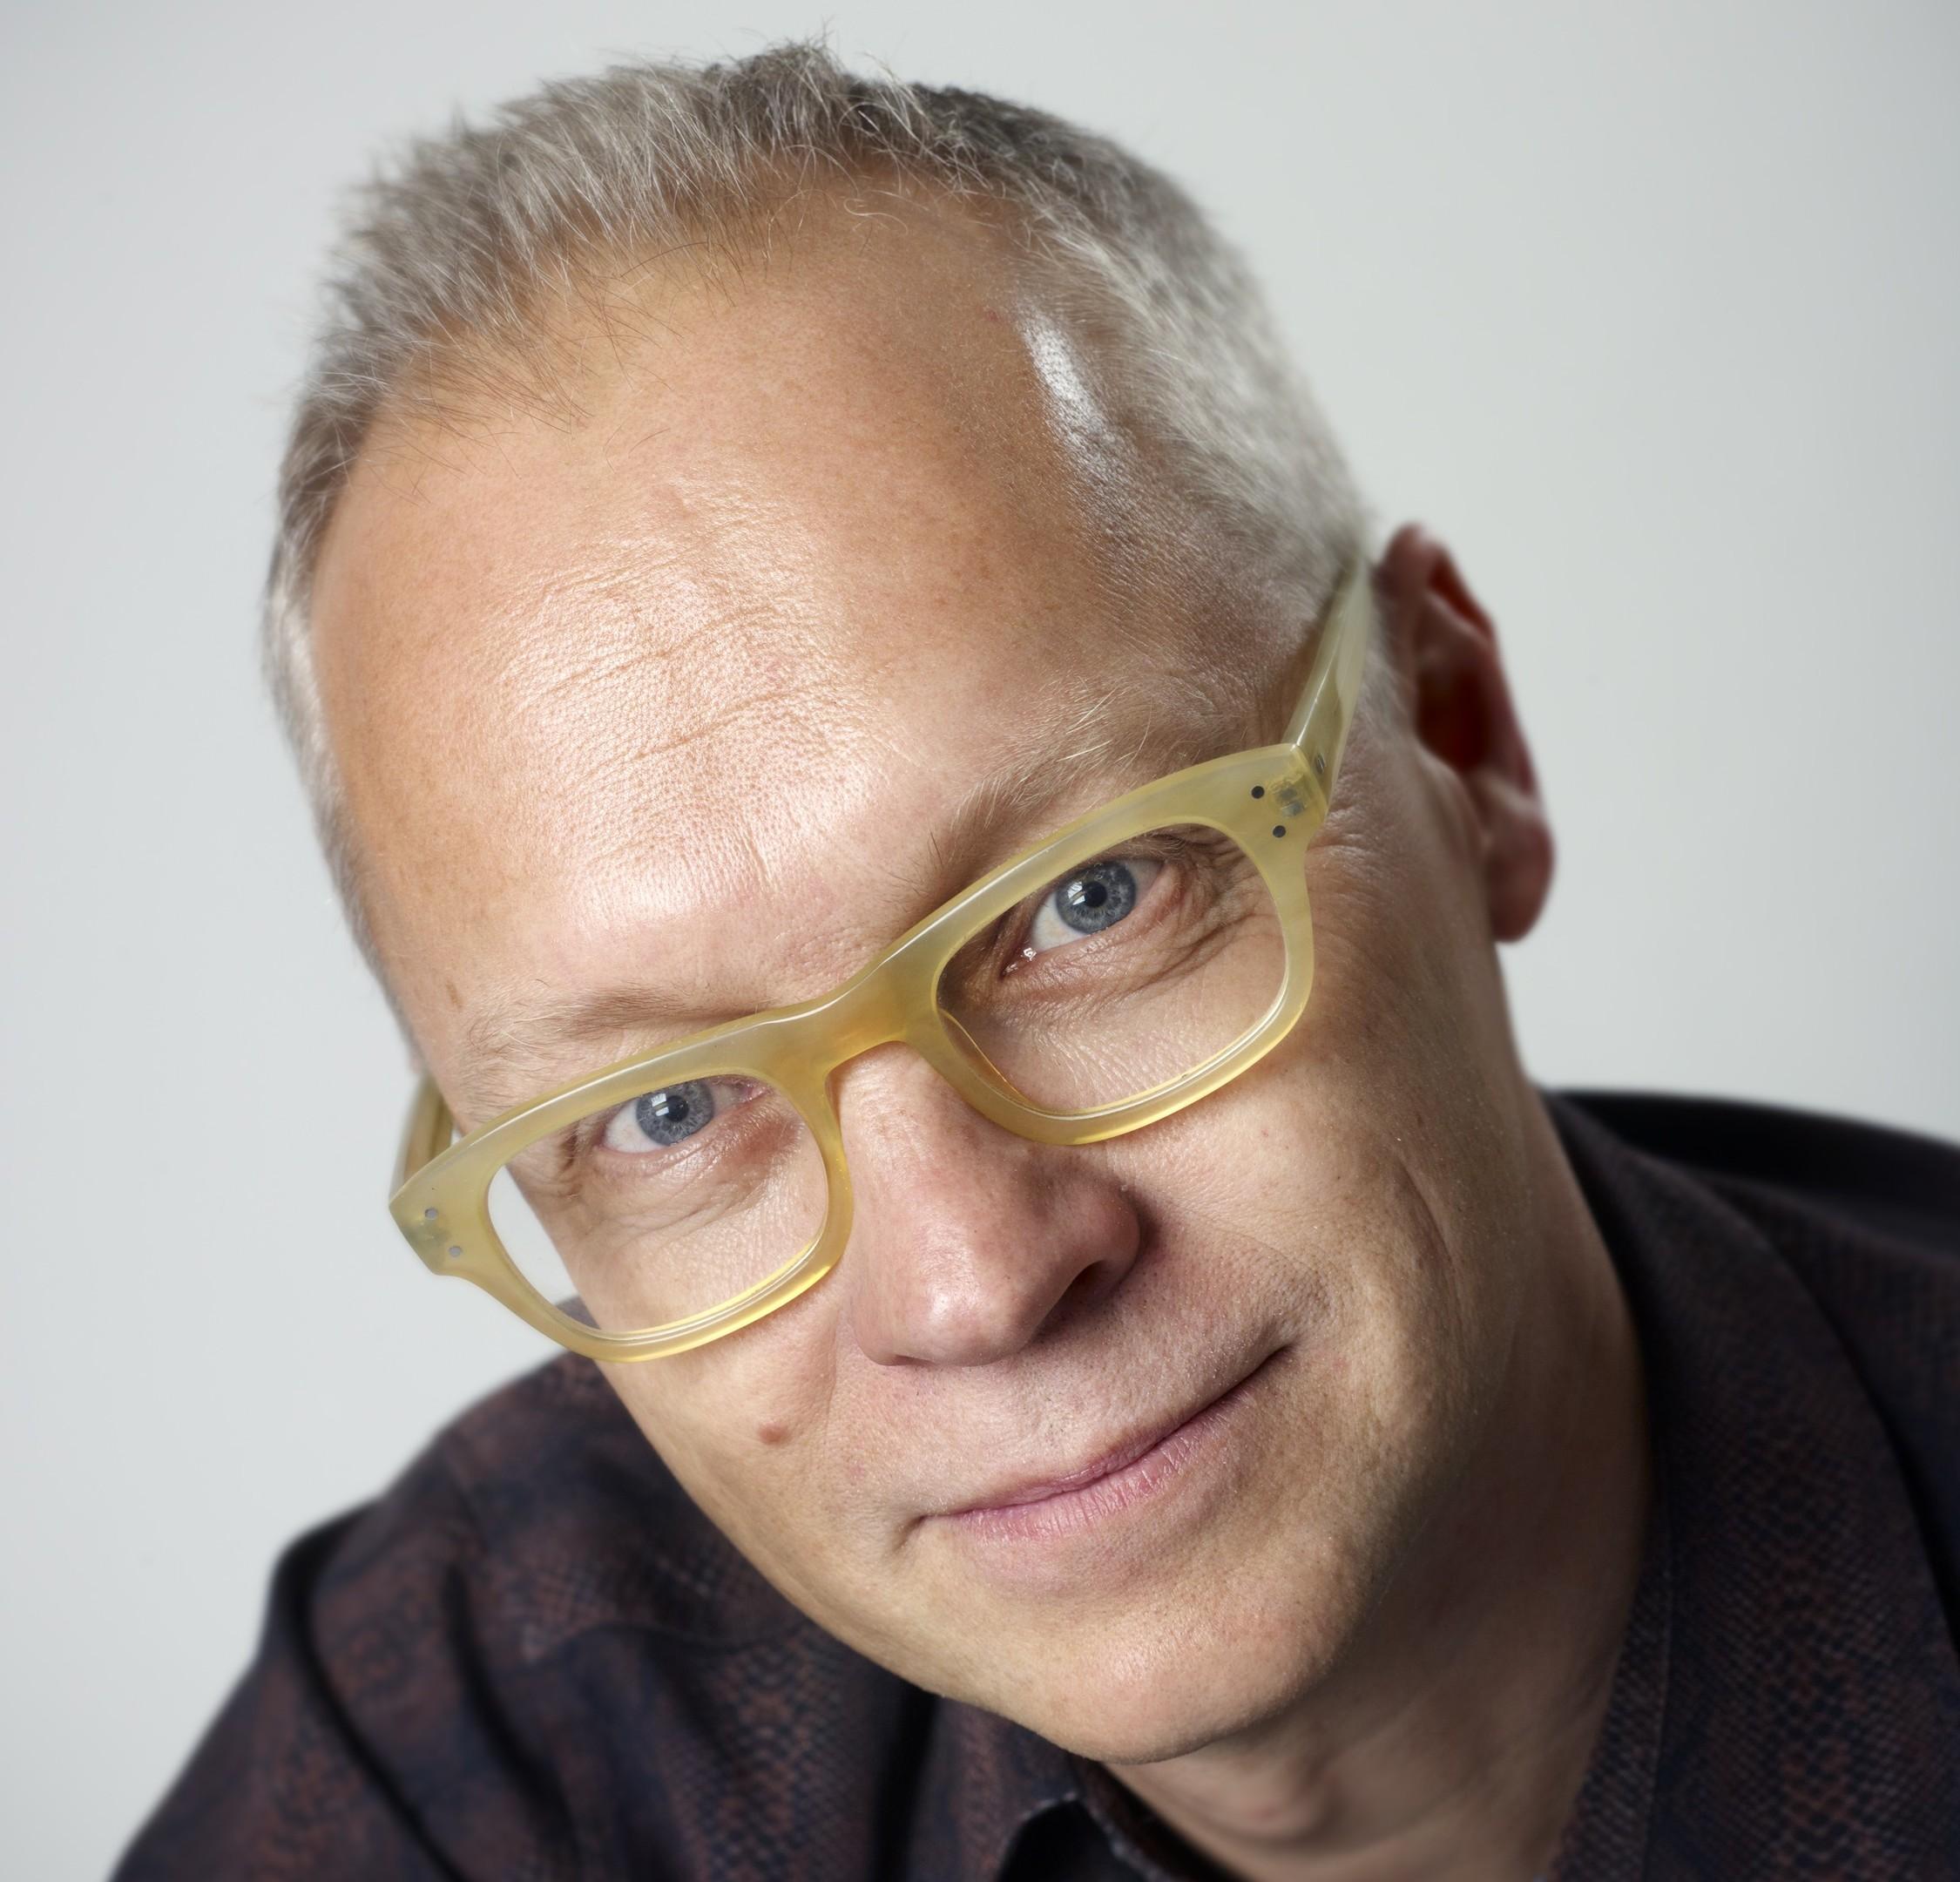 Bjorn Siesjo, city architect from Gothenburg, Sweden